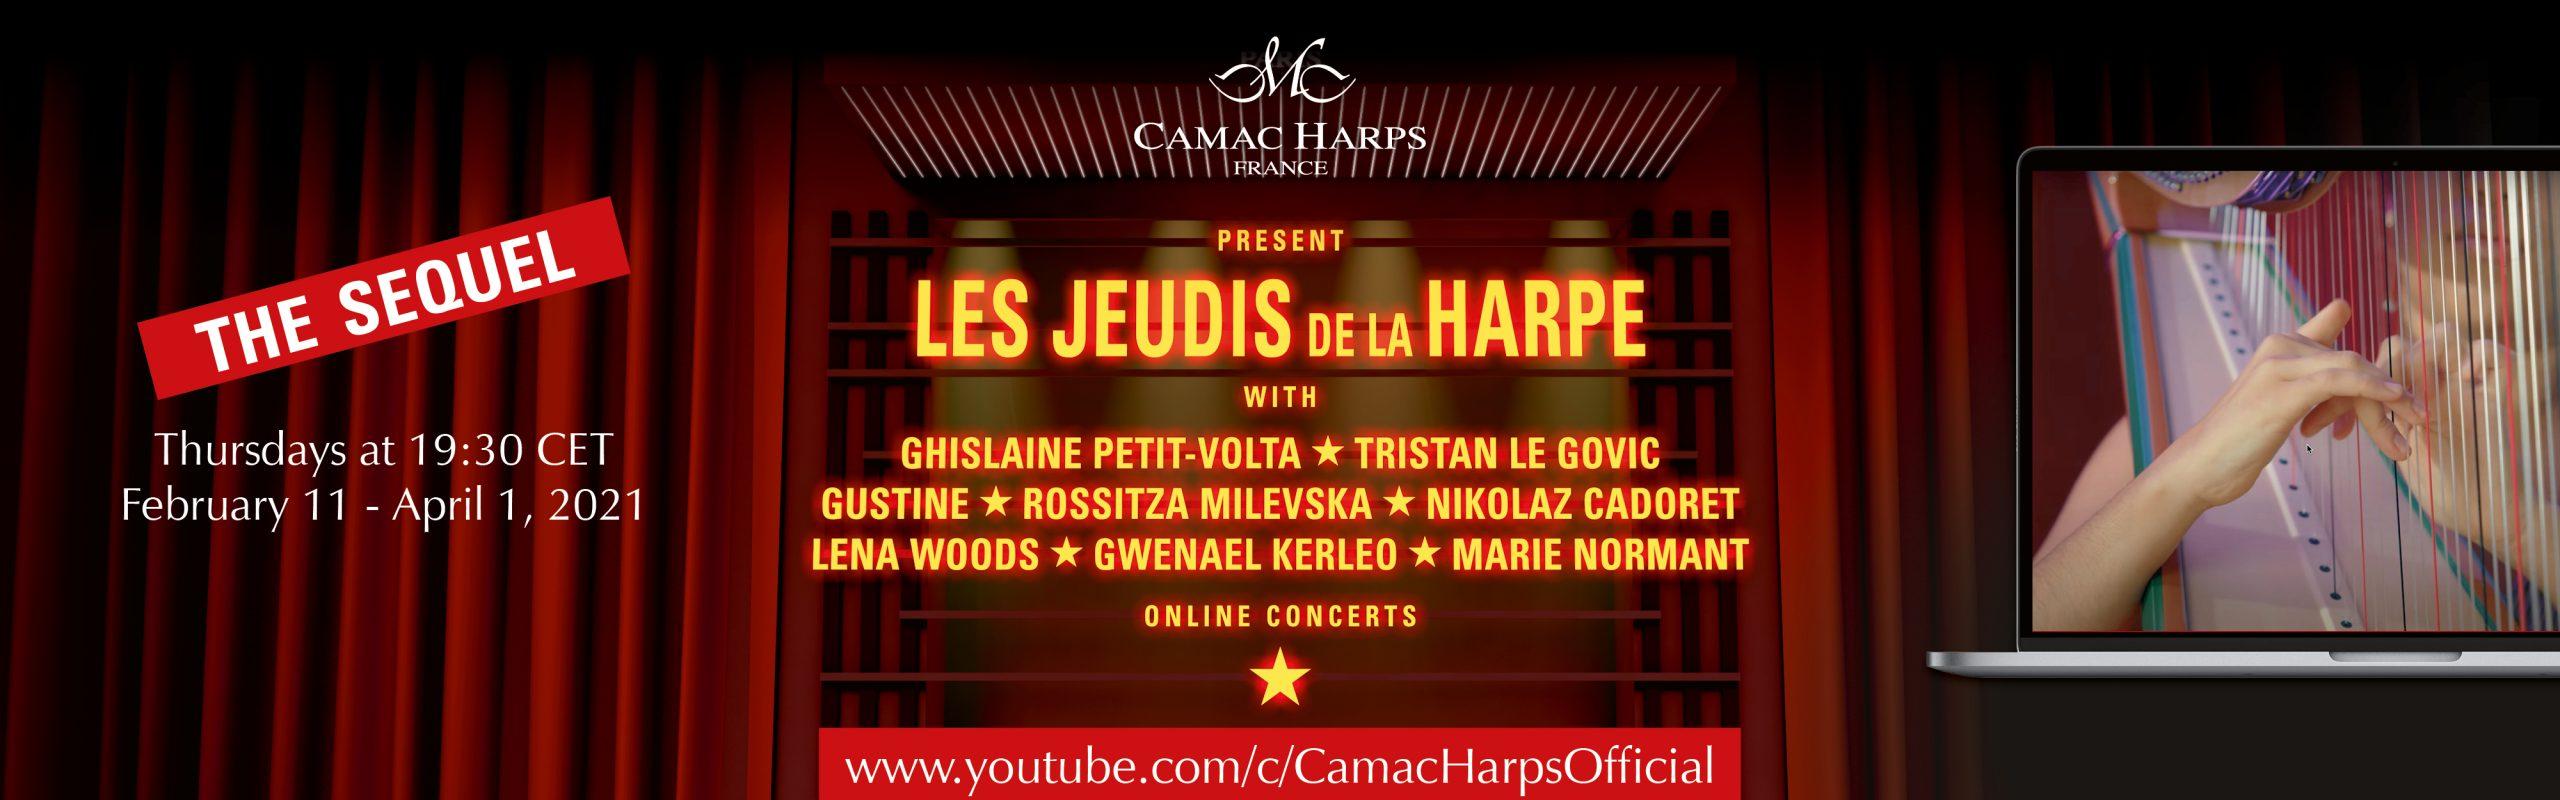 Les Jeudis de la Harpe